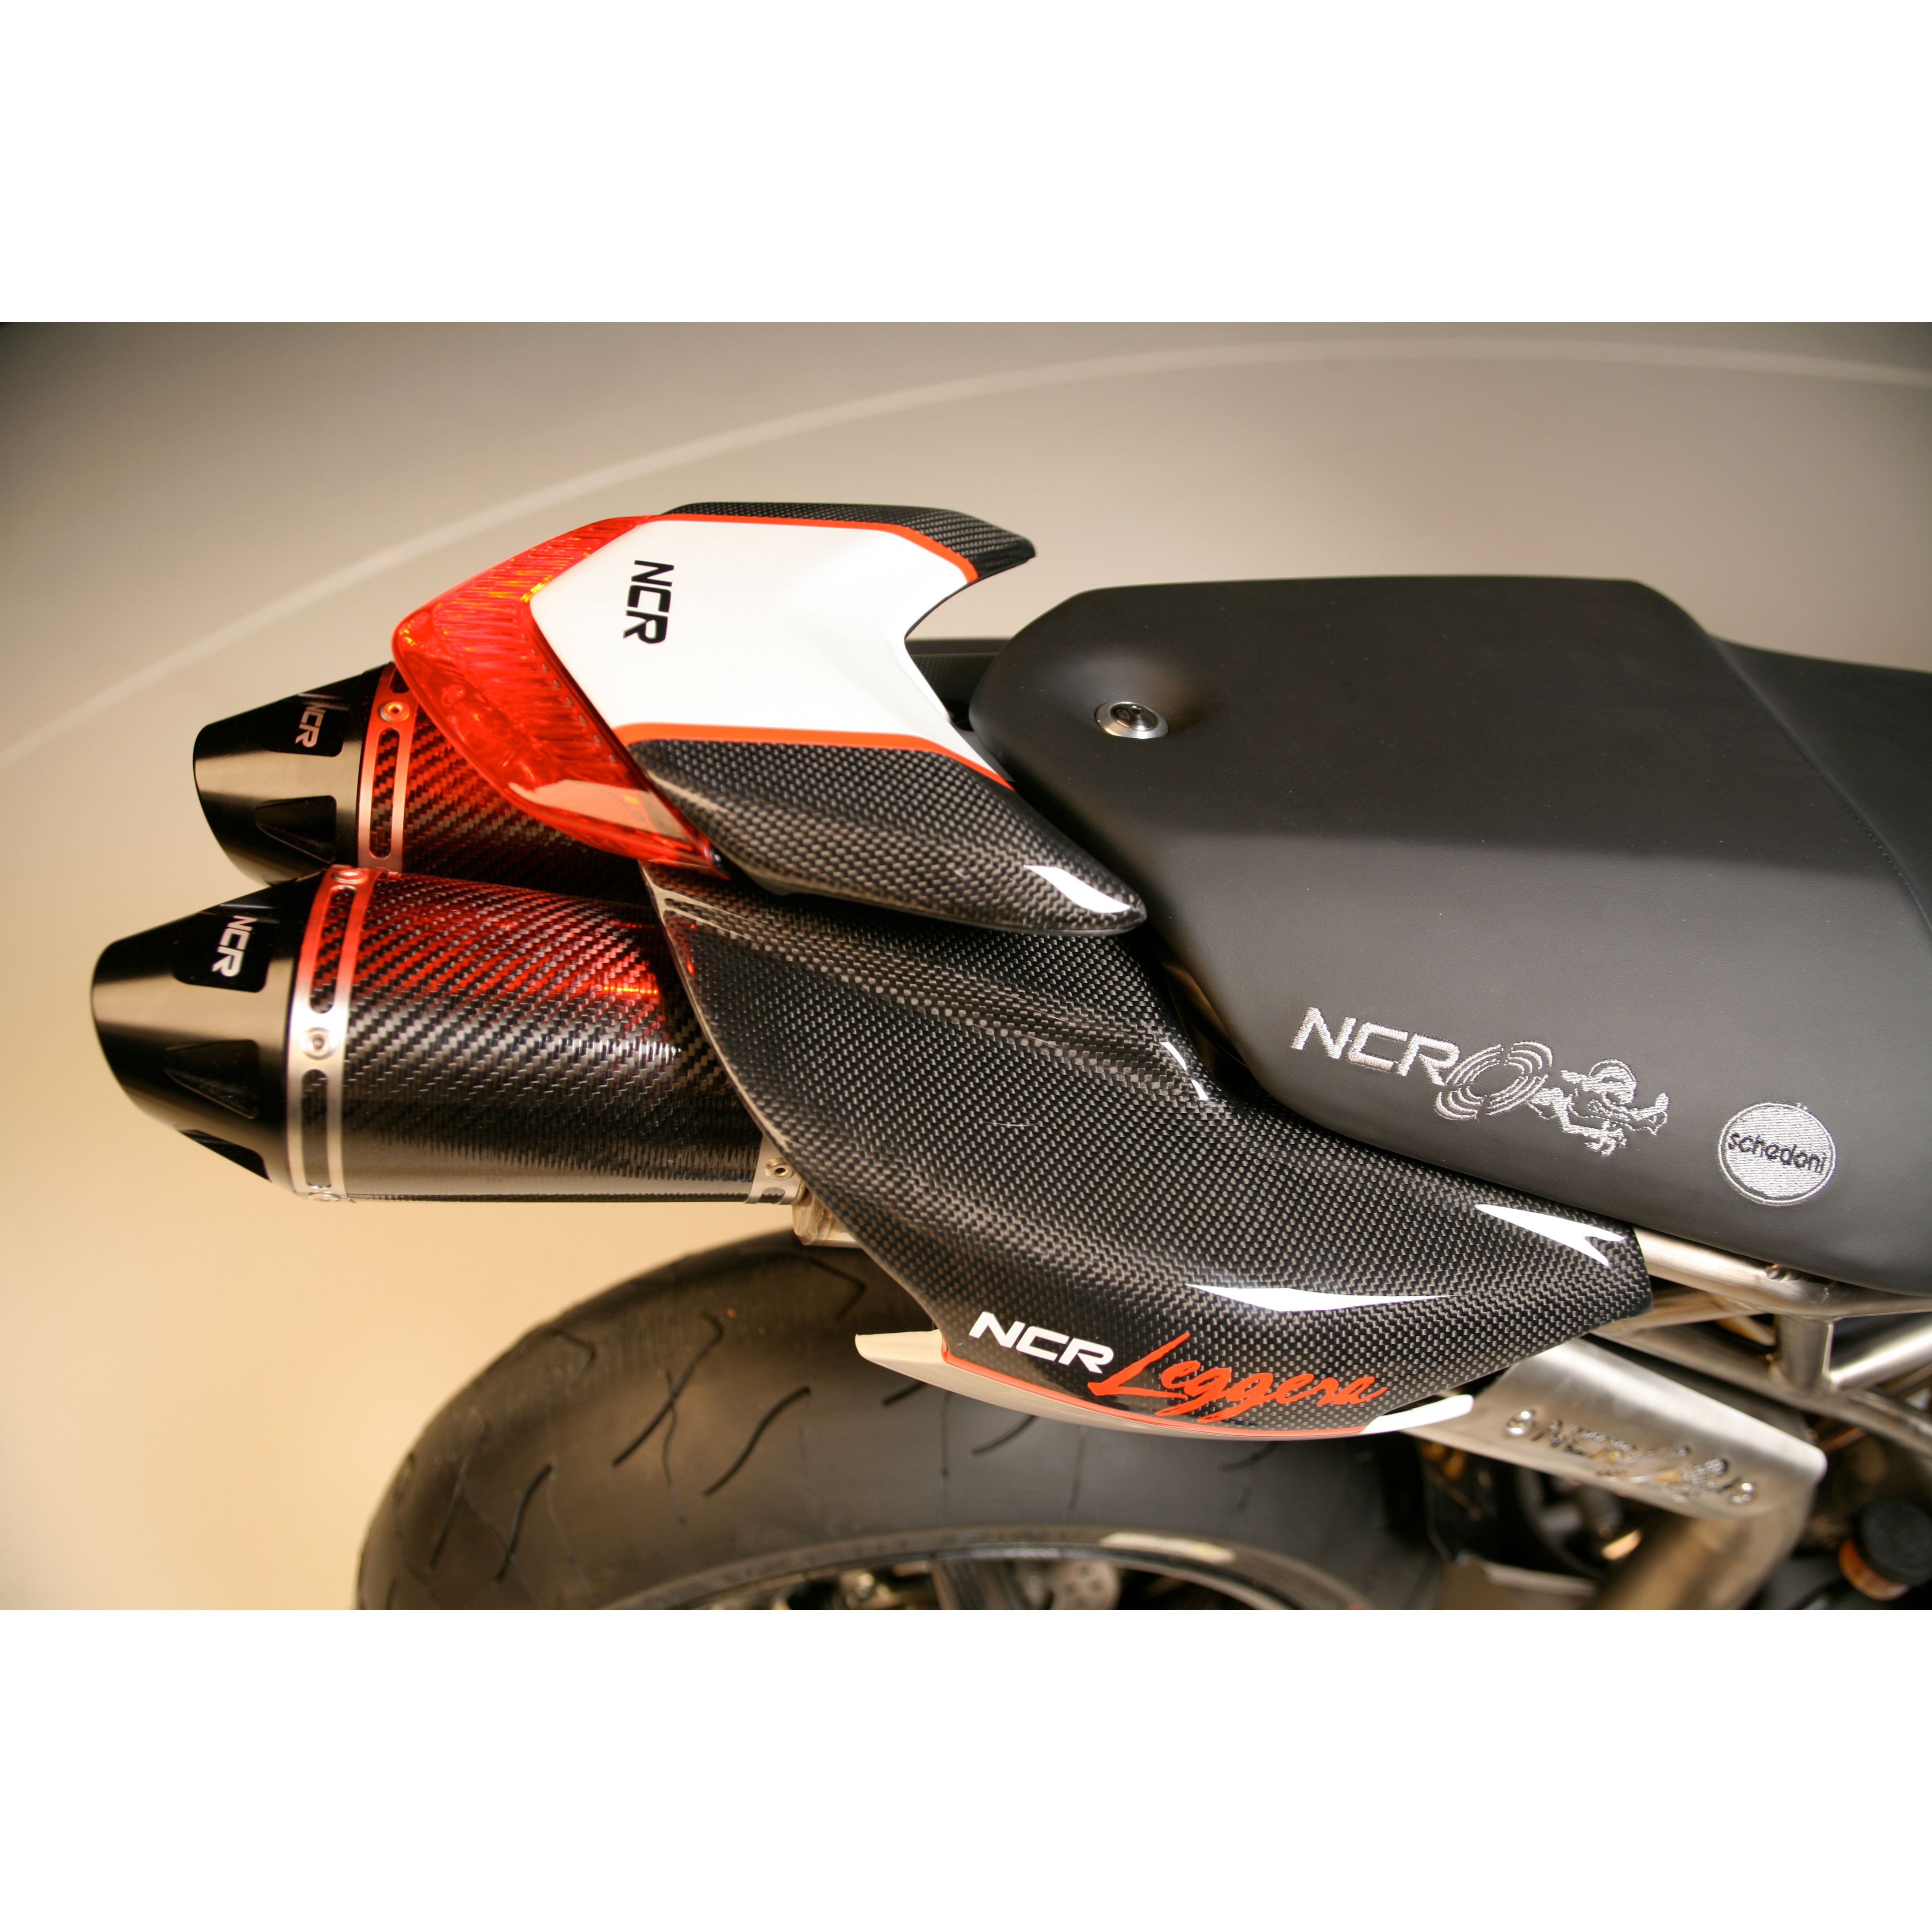 parts ducati hypermotard 796 1100 exhaust. Black Bedroom Furniture Sets. Home Design Ideas